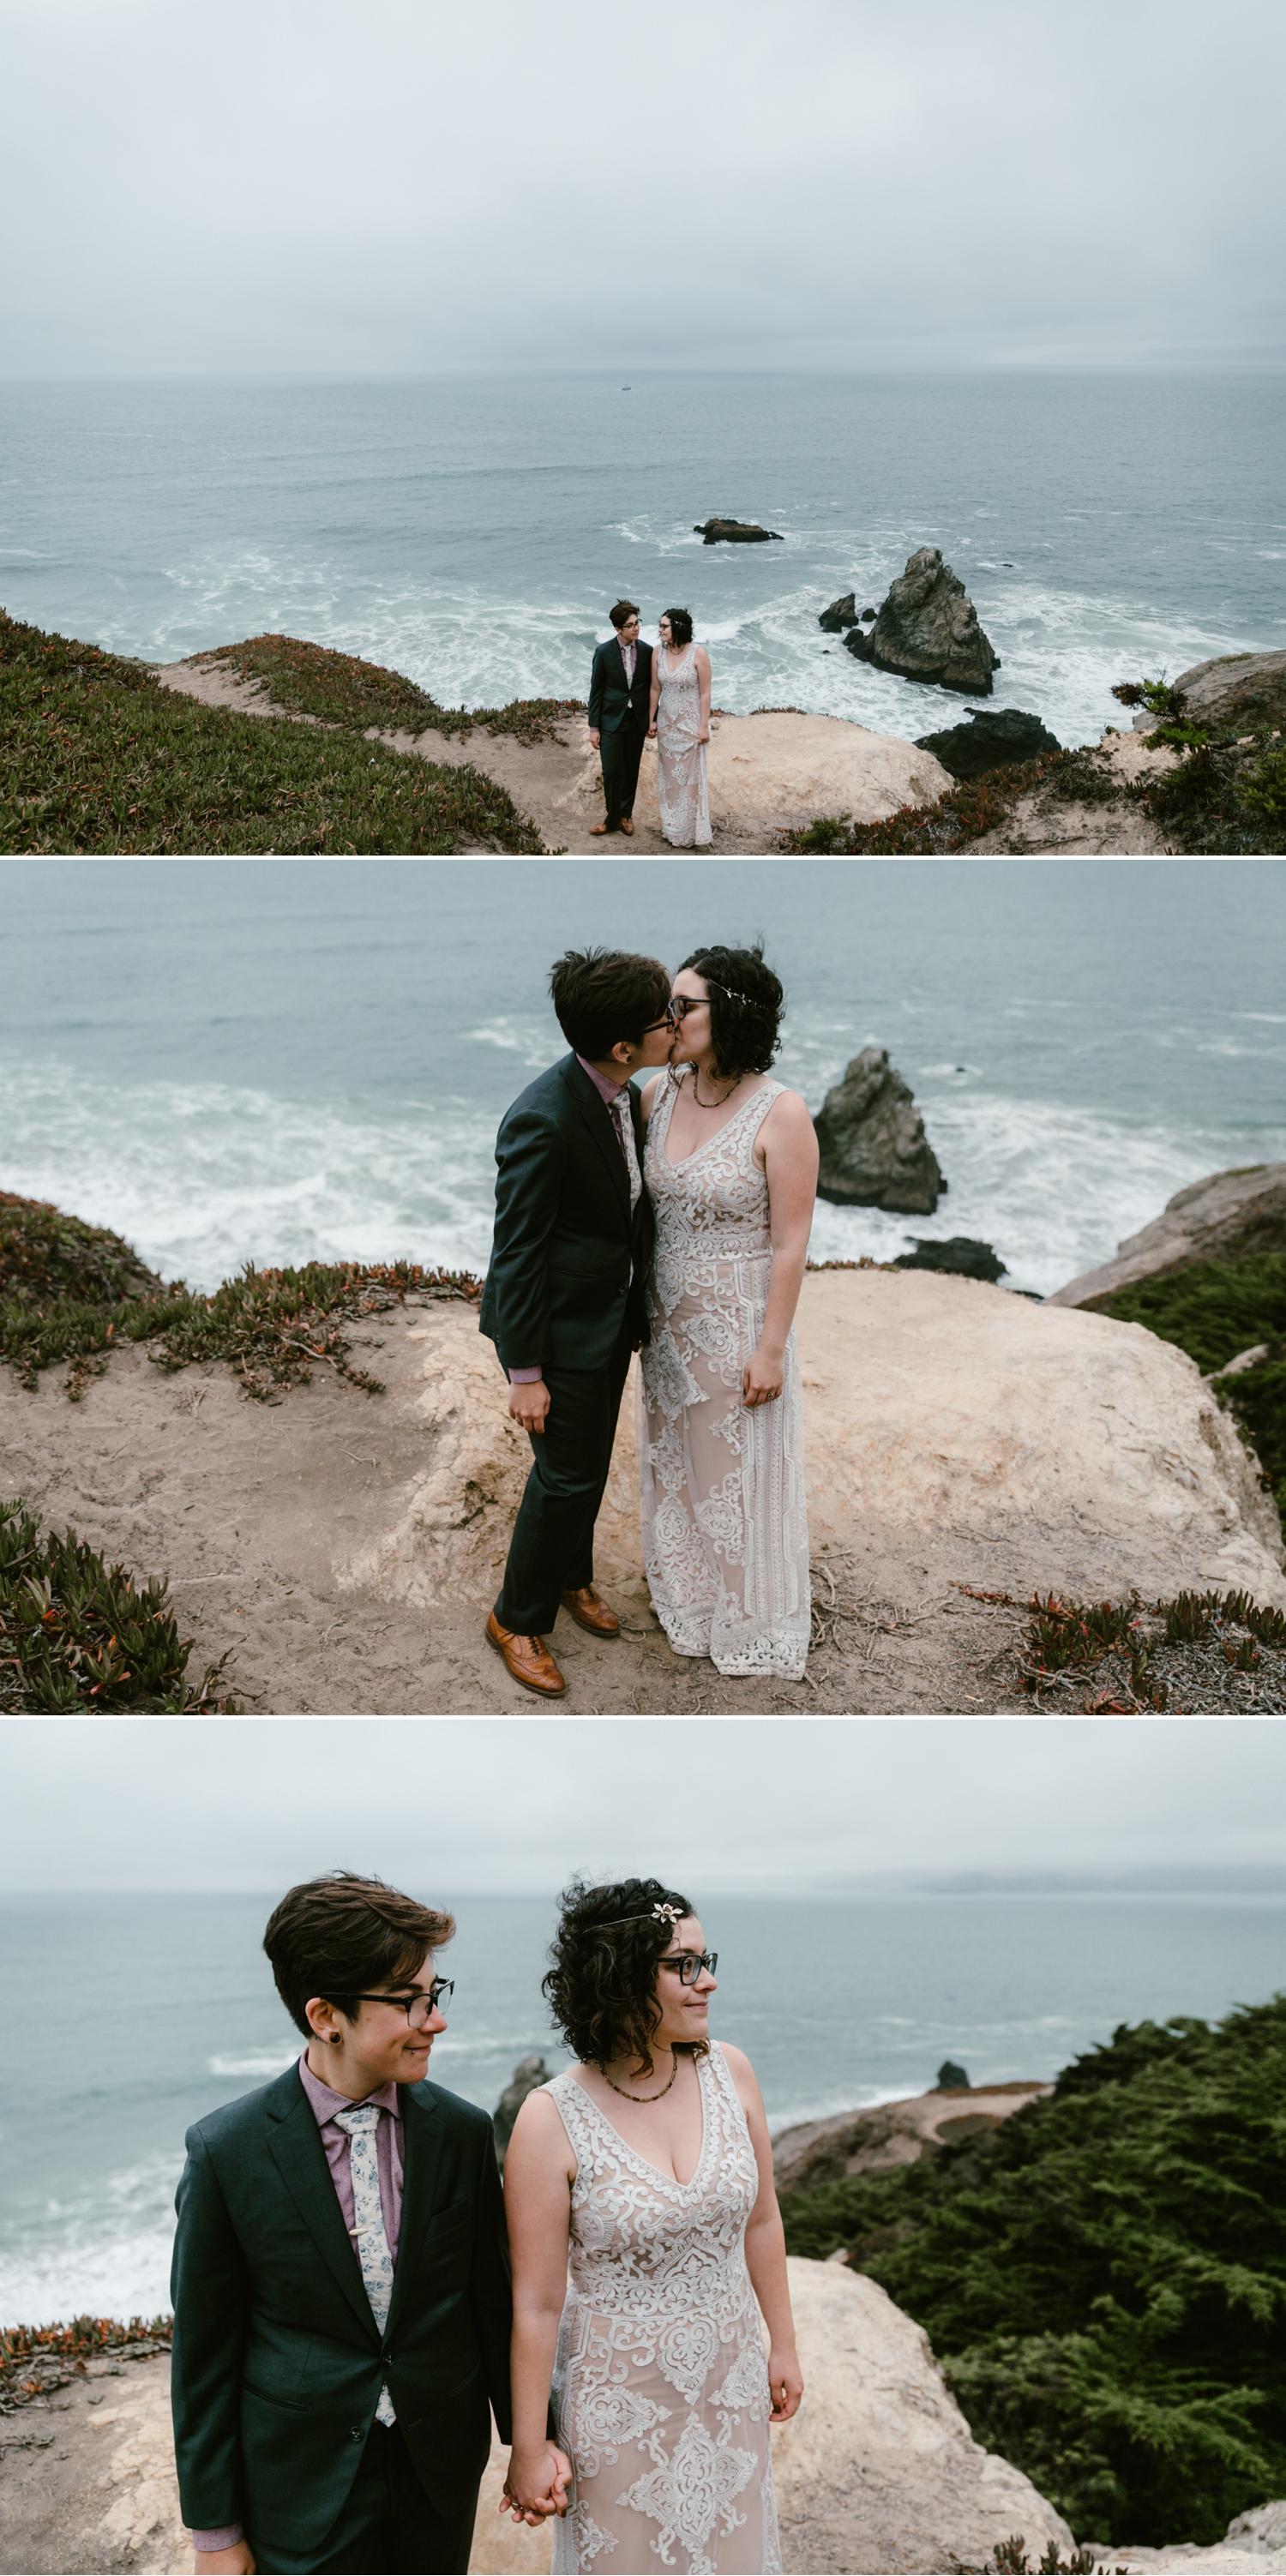 Art-deco picnic wedding in Golden Gate Park | Paige Nelson